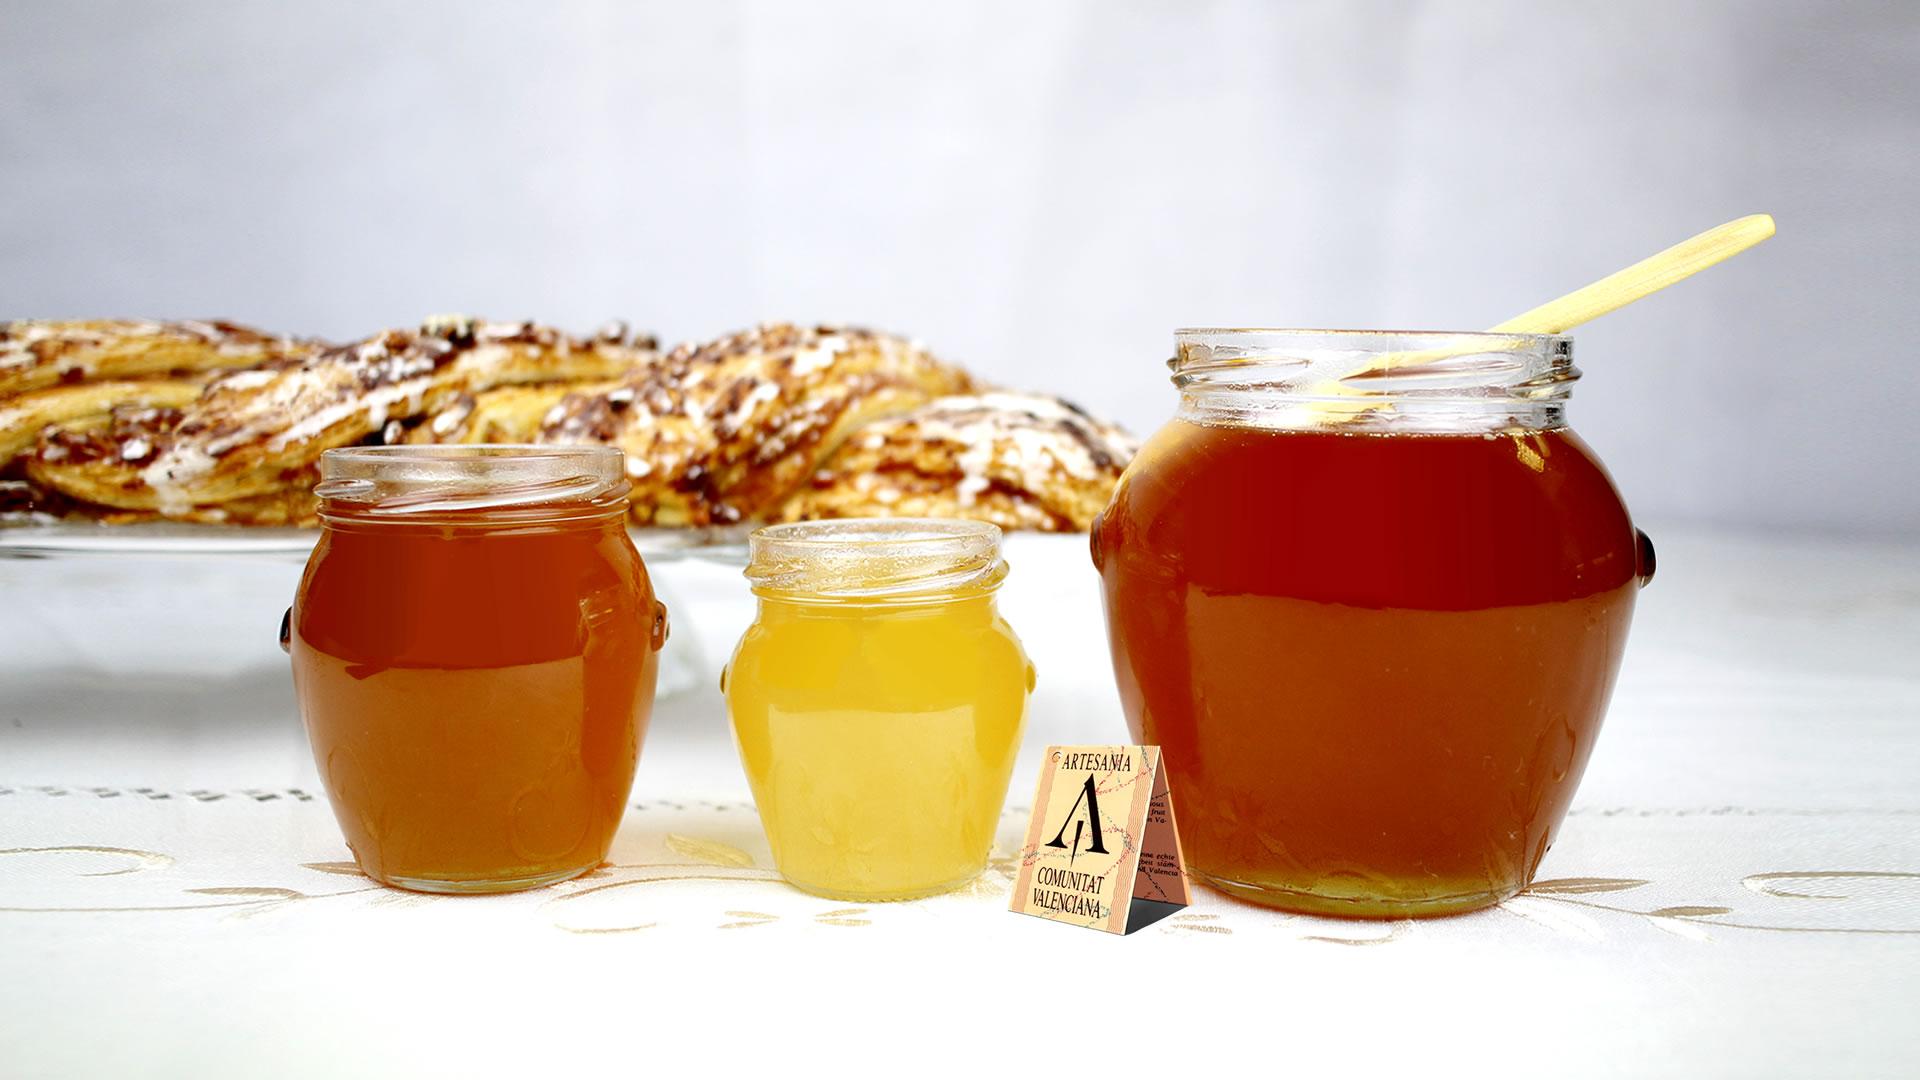 Apicultores artesanos valencia miel artesana espa a - Artesanos valencia ...